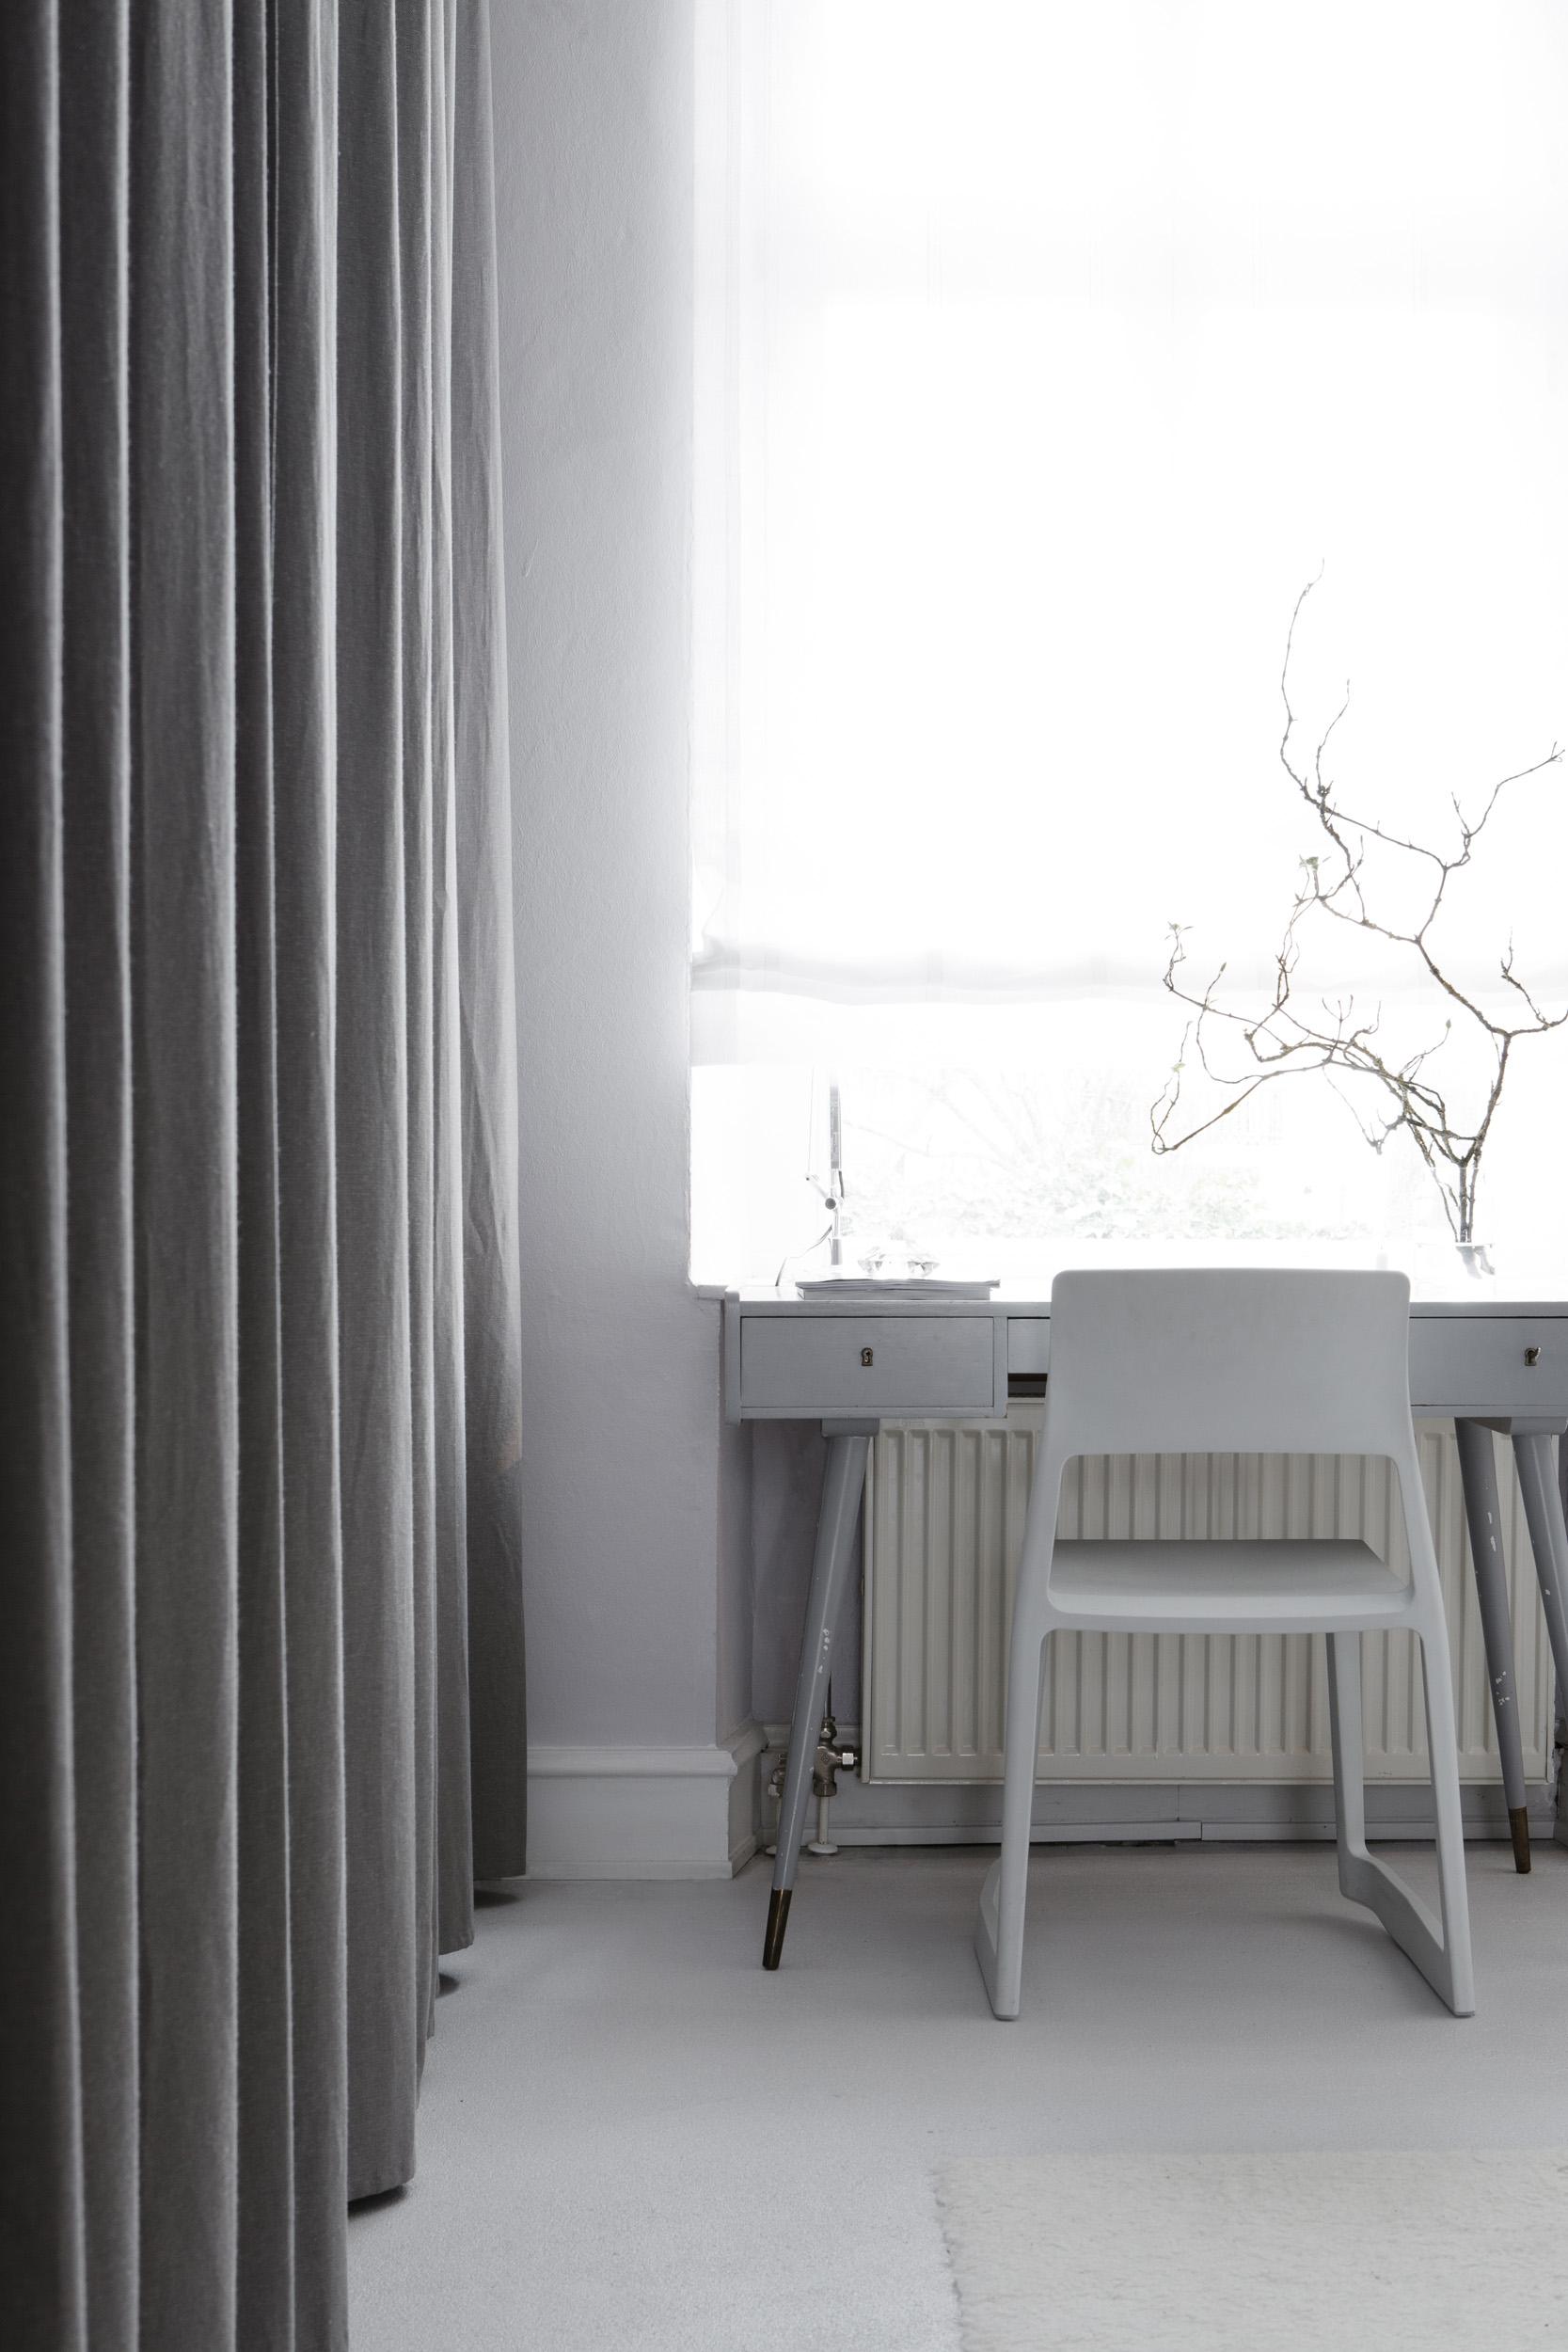 Studio-Oink-House-Cal-II-apartment-remodel-Mainz-Germany-Remodelista-1Q.jpg